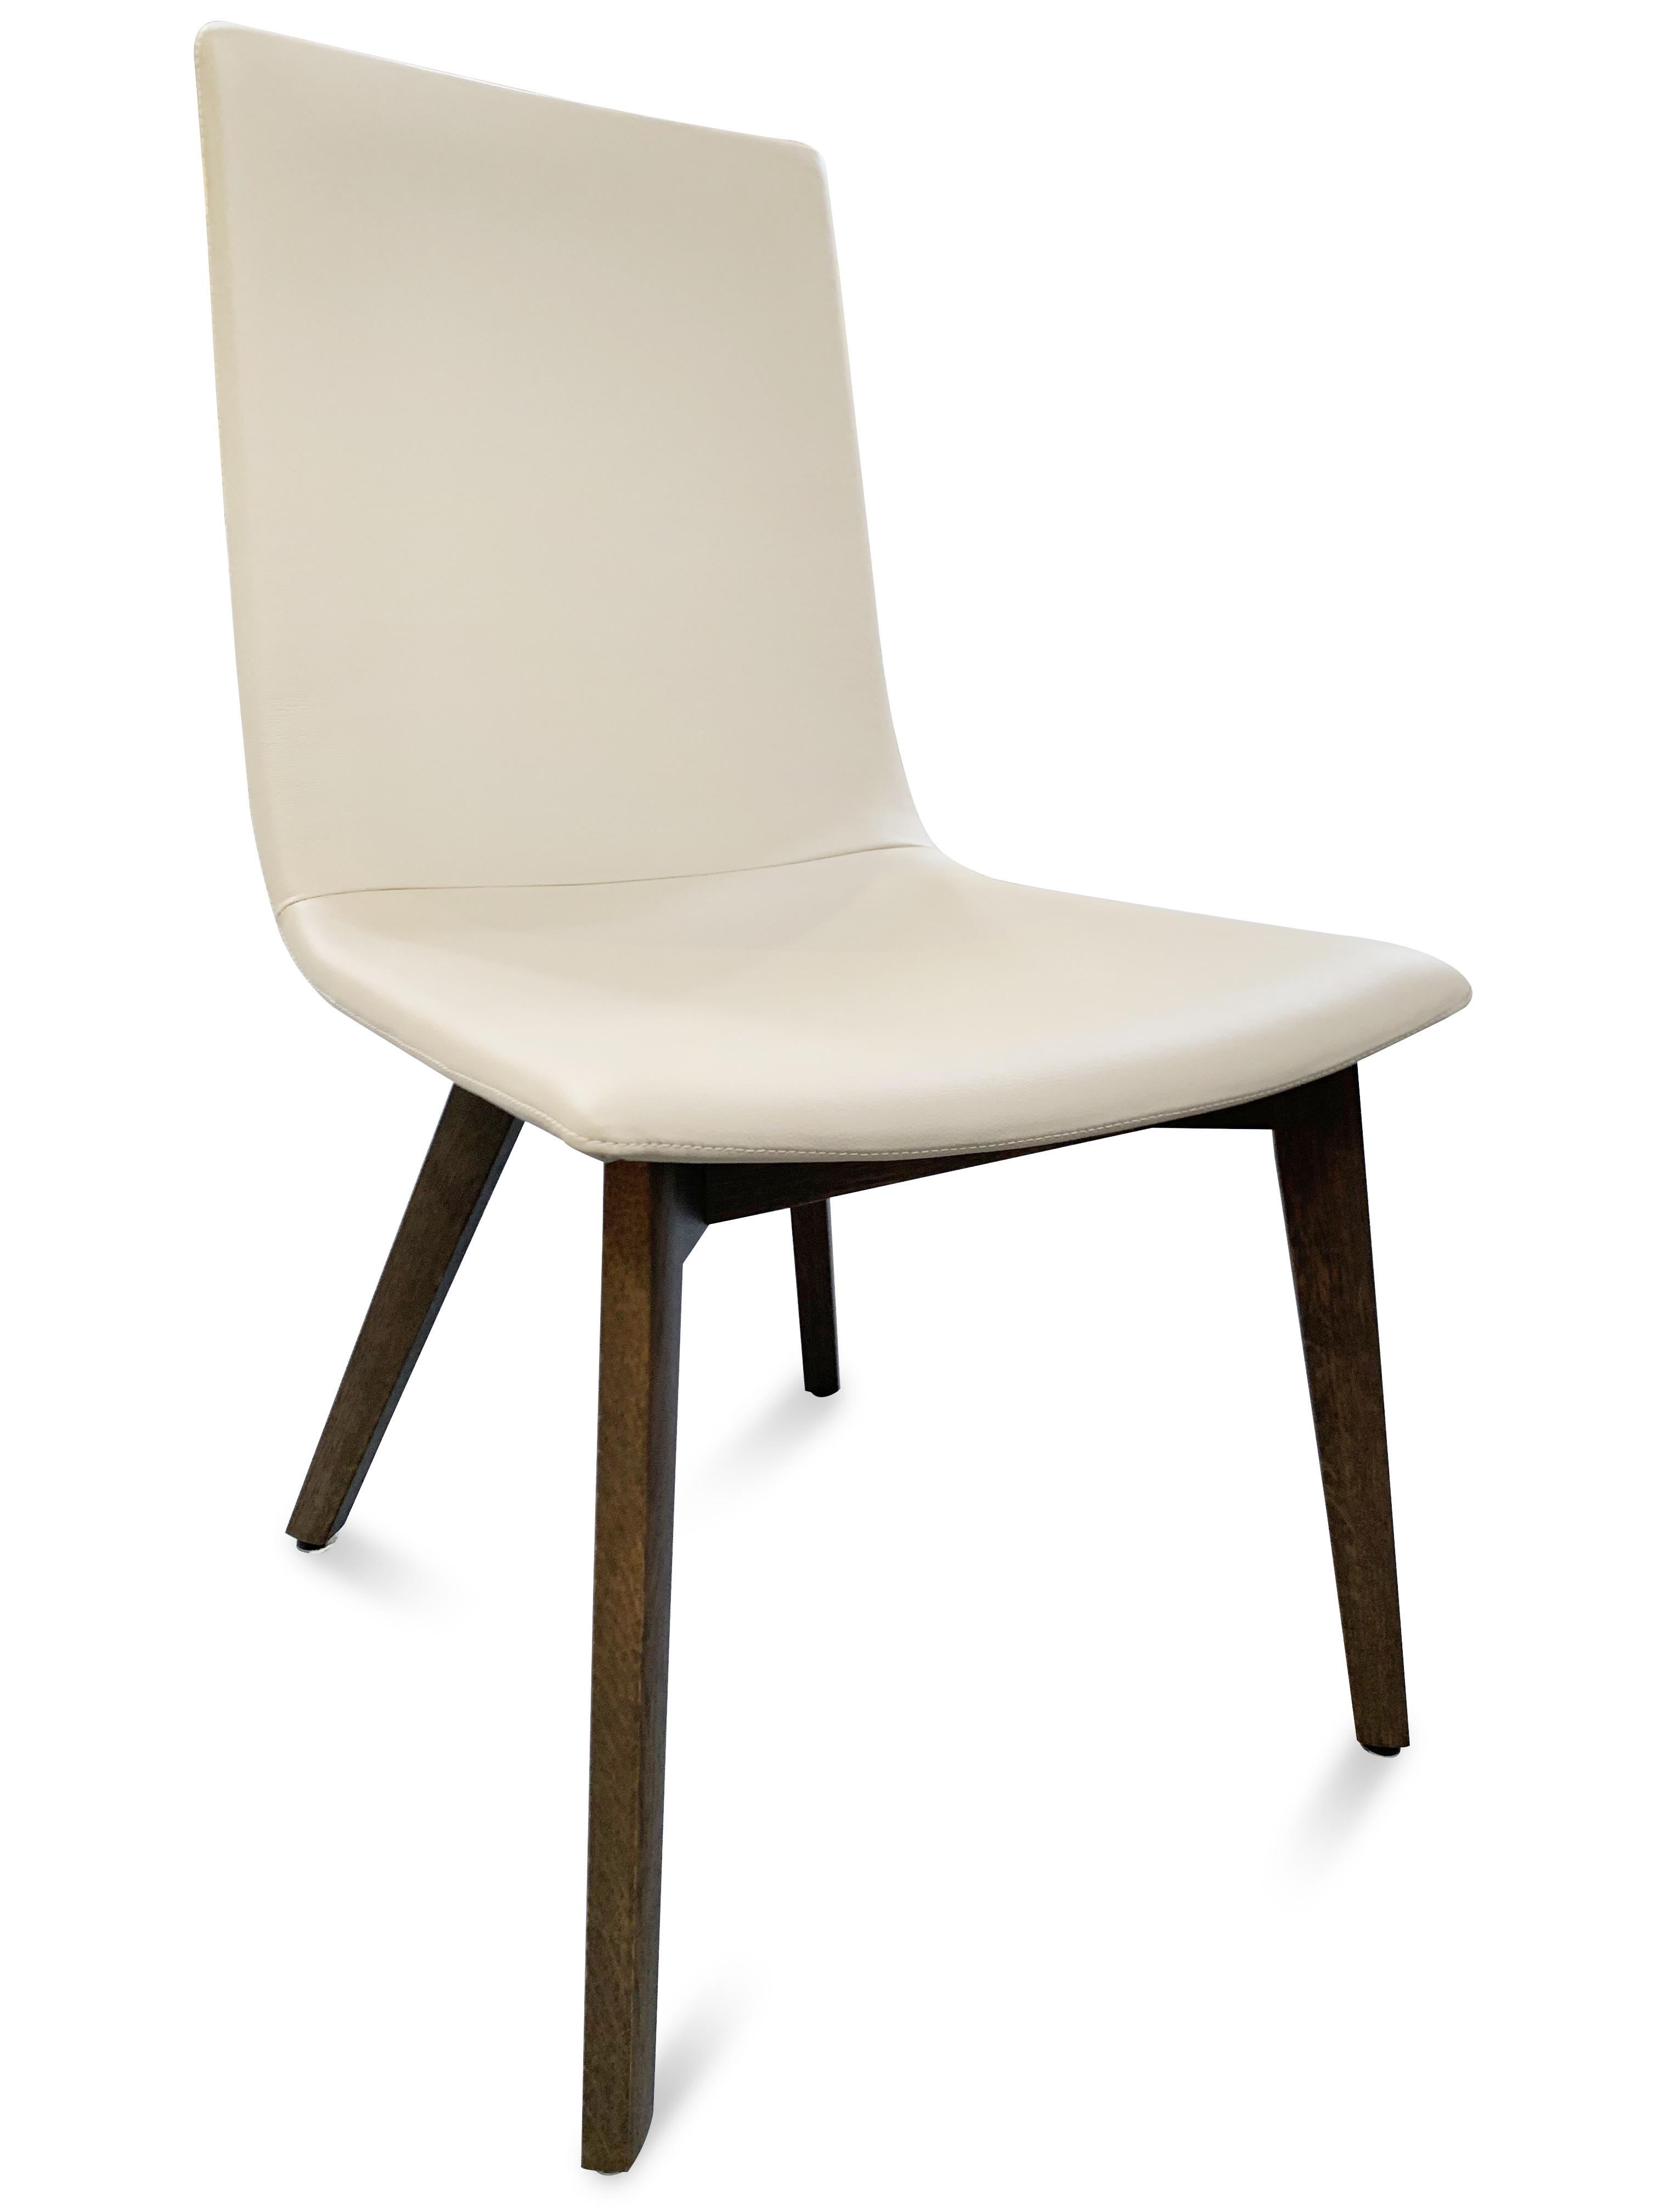 Stühle (4er-Set) + mit Armlehne (2er-Set) Hülsta 06